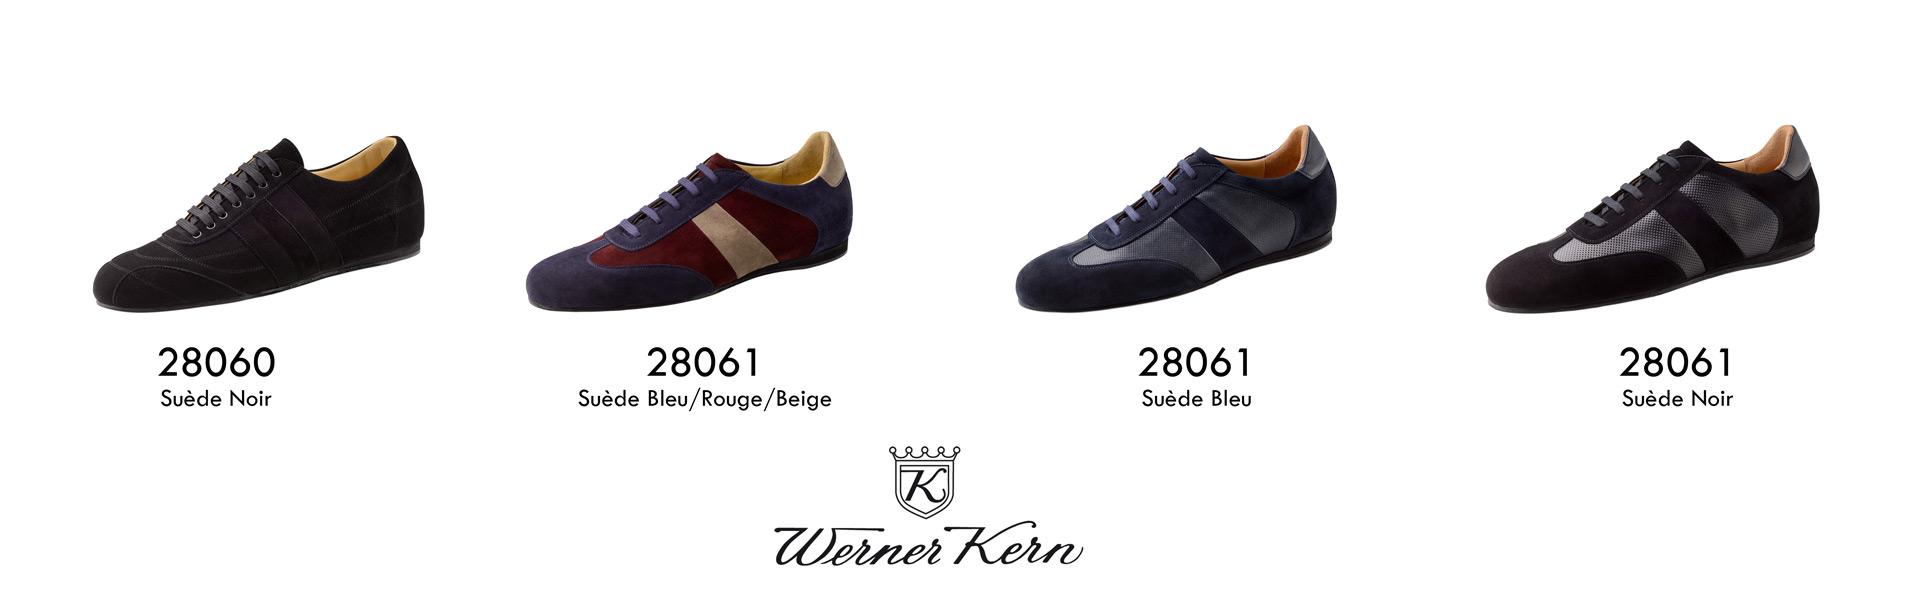 Werner Kern Chaussures de Danse